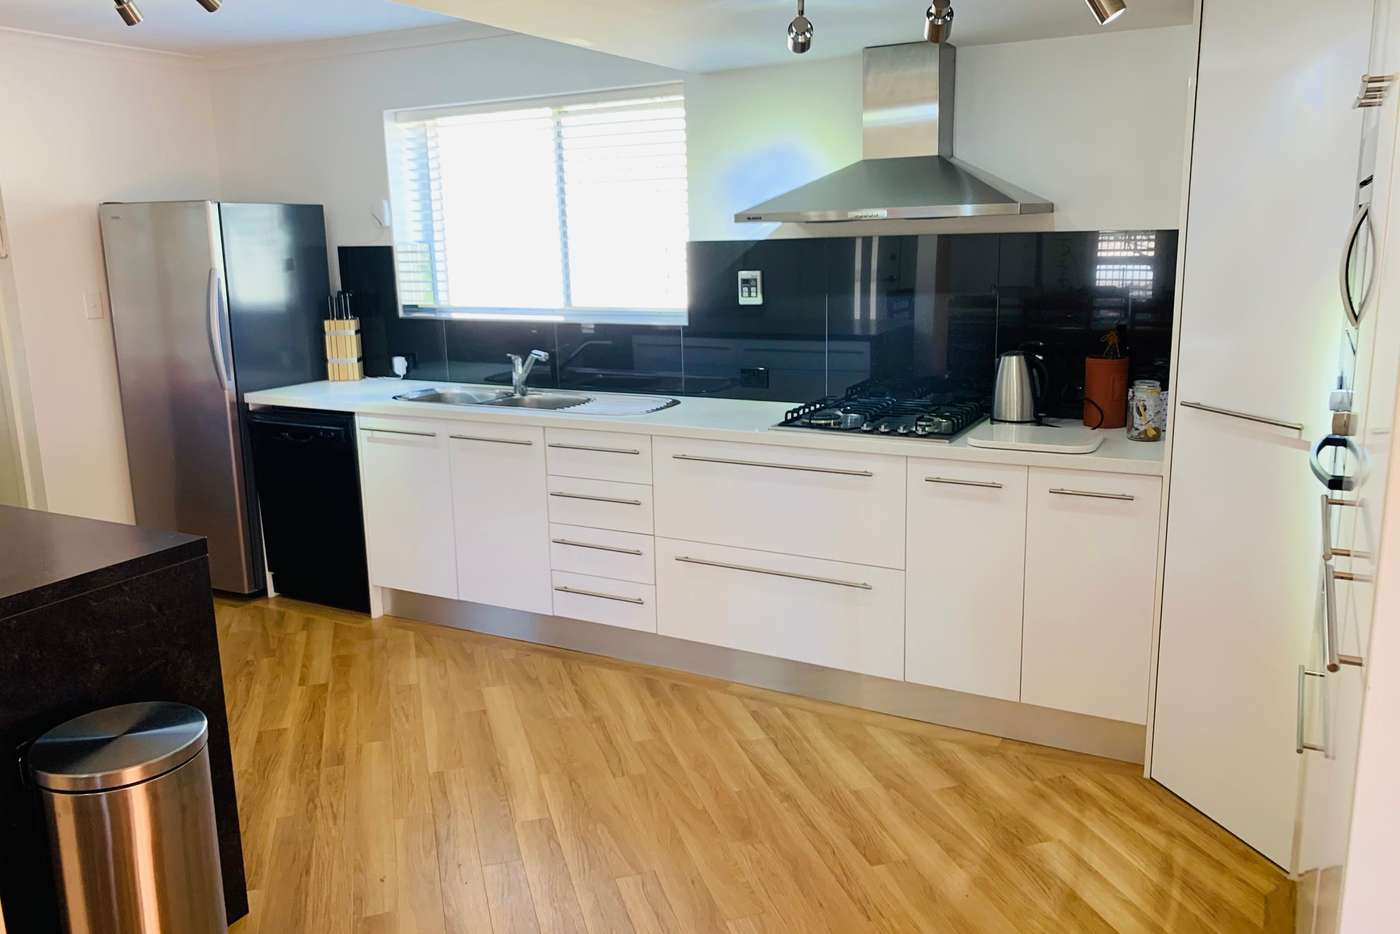 Sixth view of Homely house listing, 10 Randolph Street, Port Hughes SA 5558